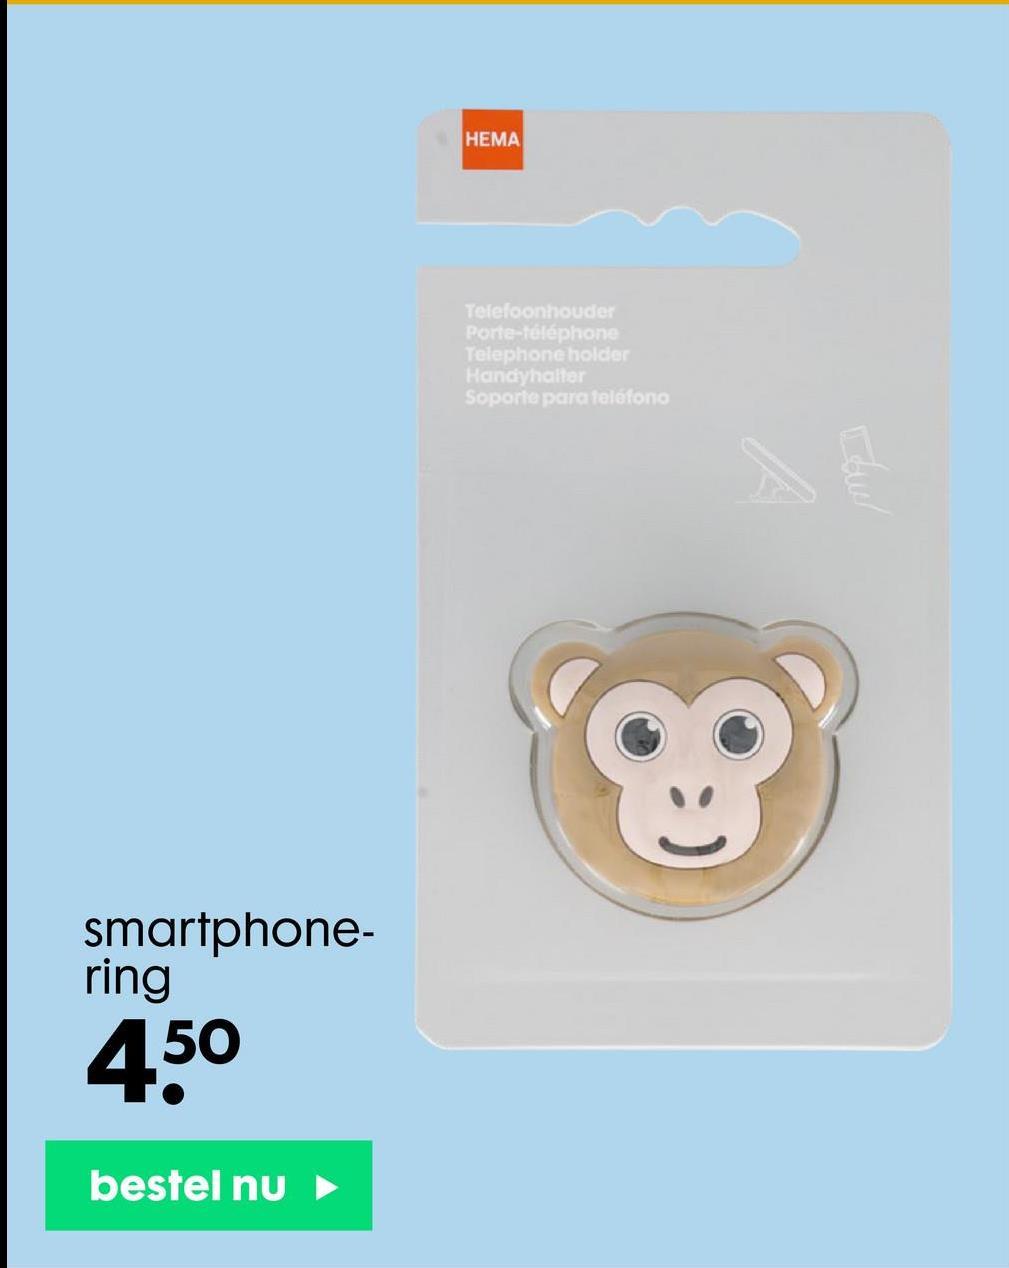 HEMA Telefoonhouder Porte-téléphone Telephone holder Handyhalter Soporte para teléfono Lewe smartphone- ring 450 bestel nu